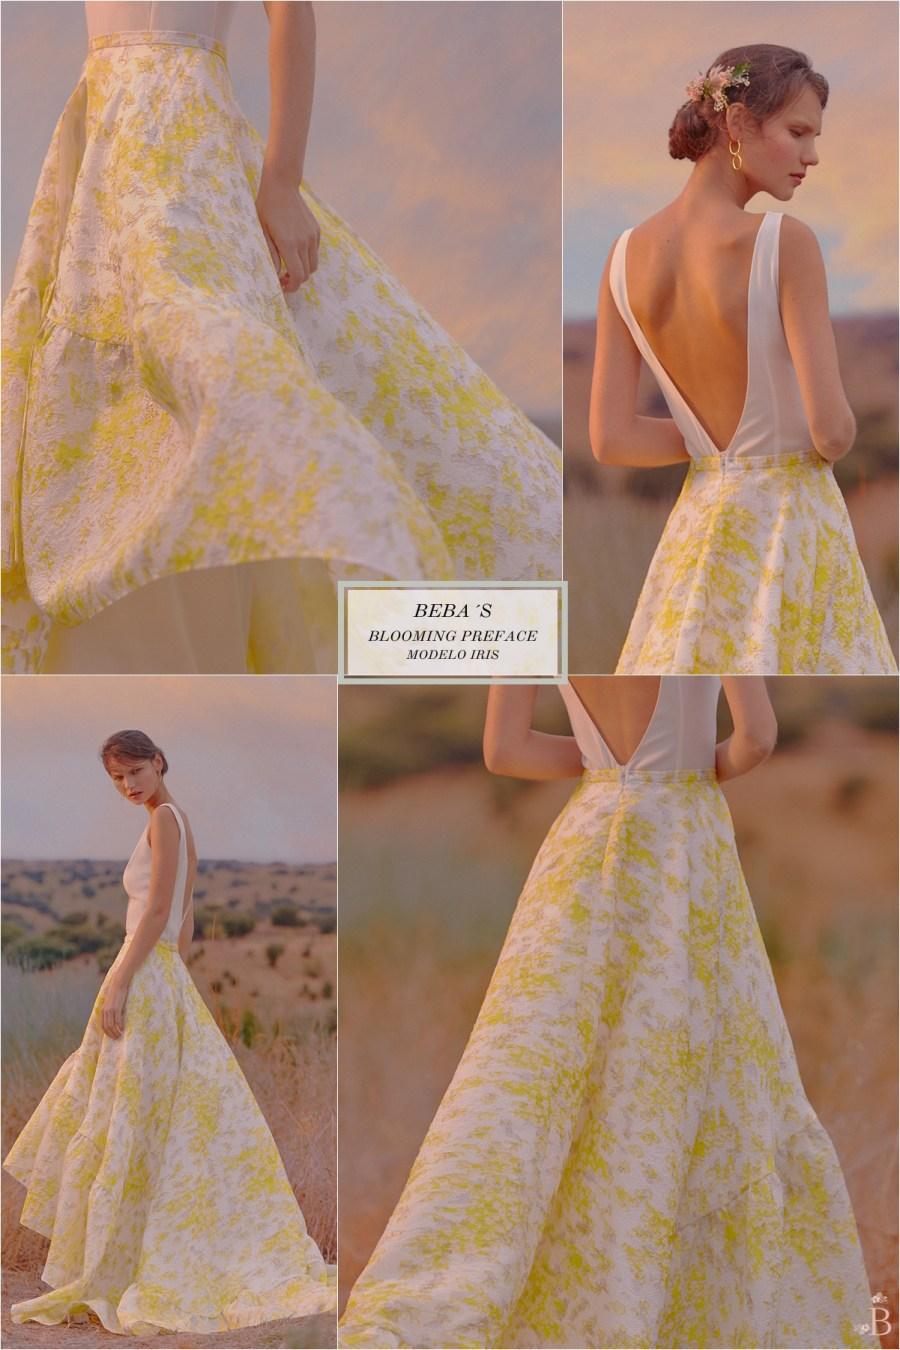 Blooming Preface - Beba´s . Modelo Iris